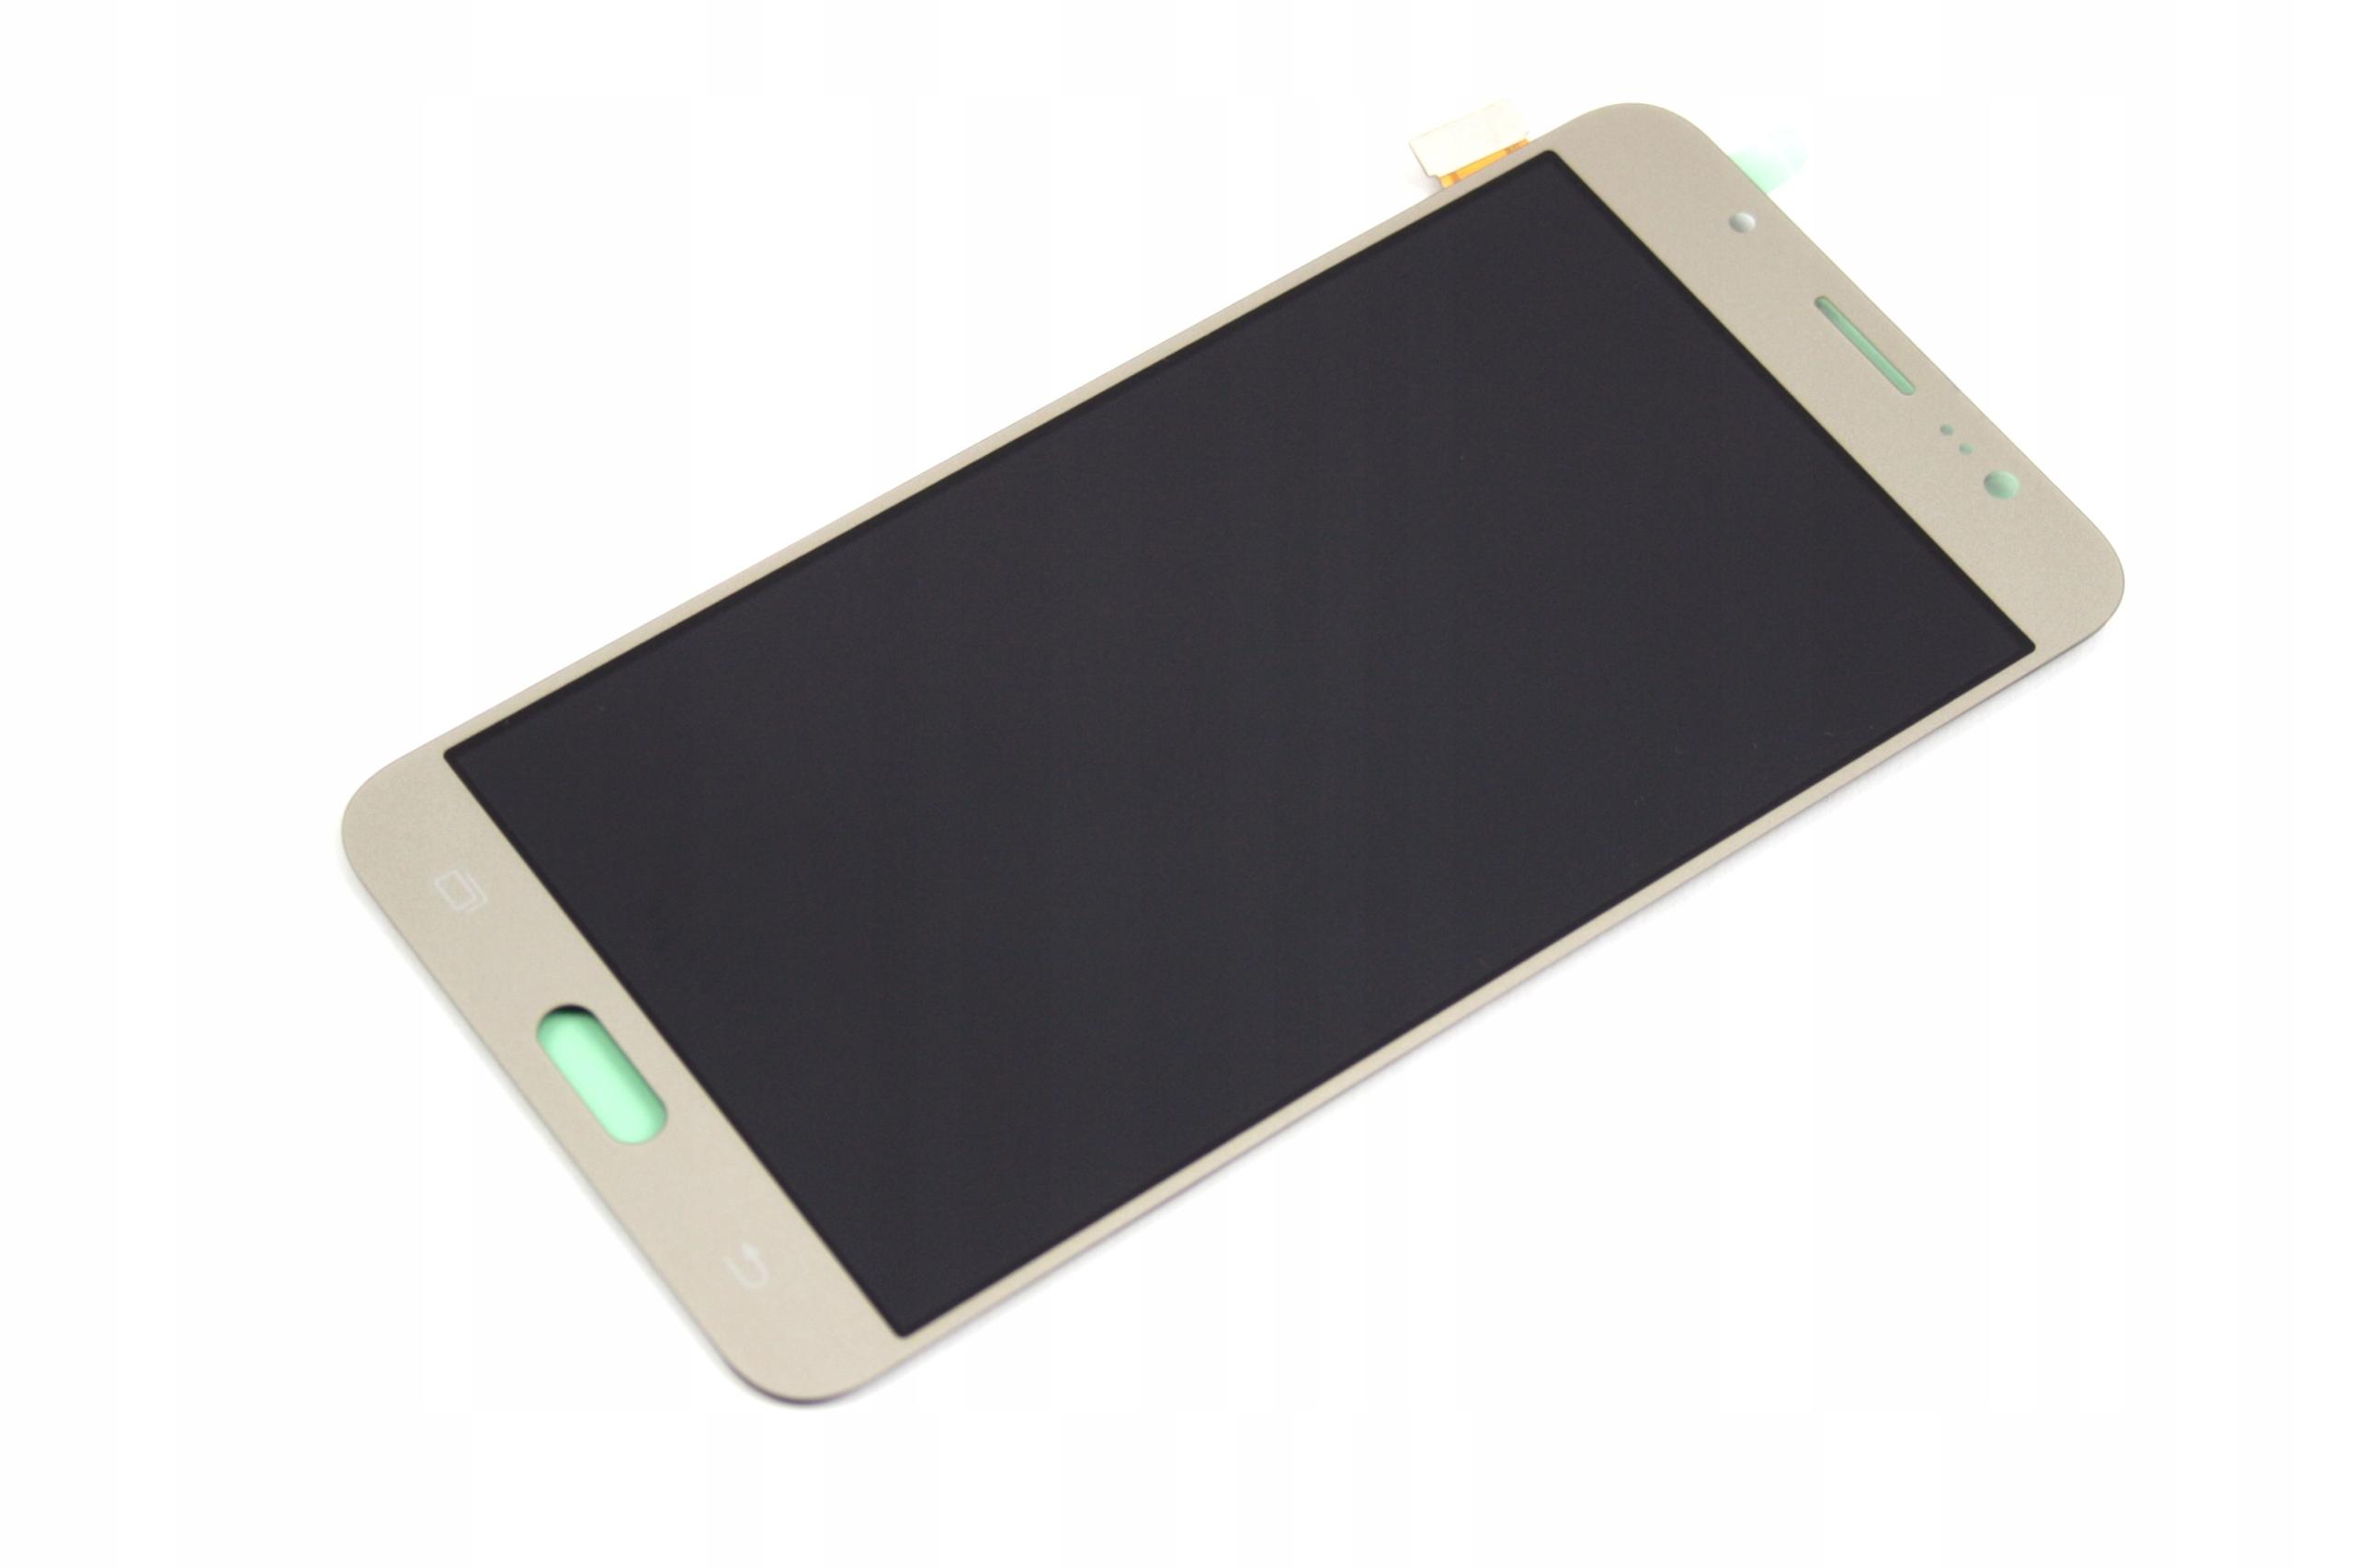 LCD WYŚWIETLACZ DOTYK SAMSUNG GALAXY J710FN J710F